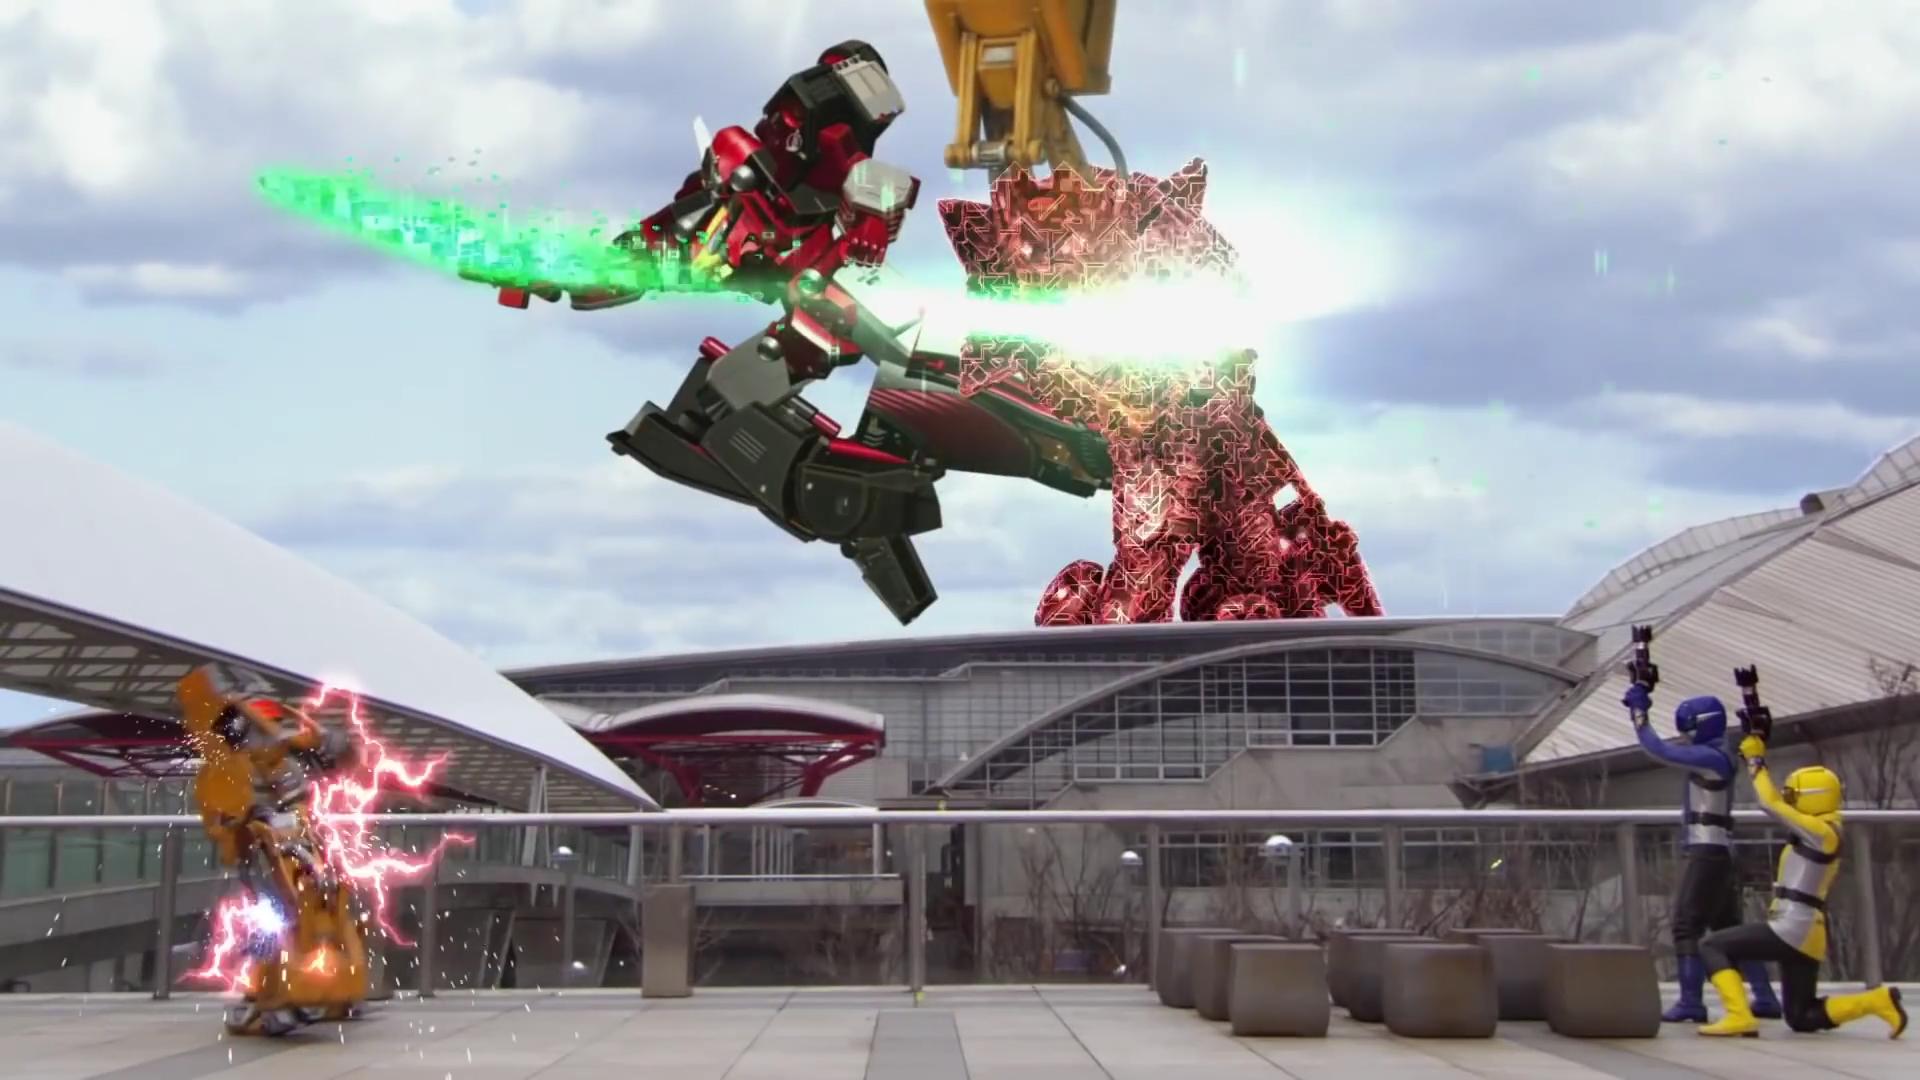 Comparison:Mission 1: Tokumei Sentai, Assemble! vs. Beasts Unleashed